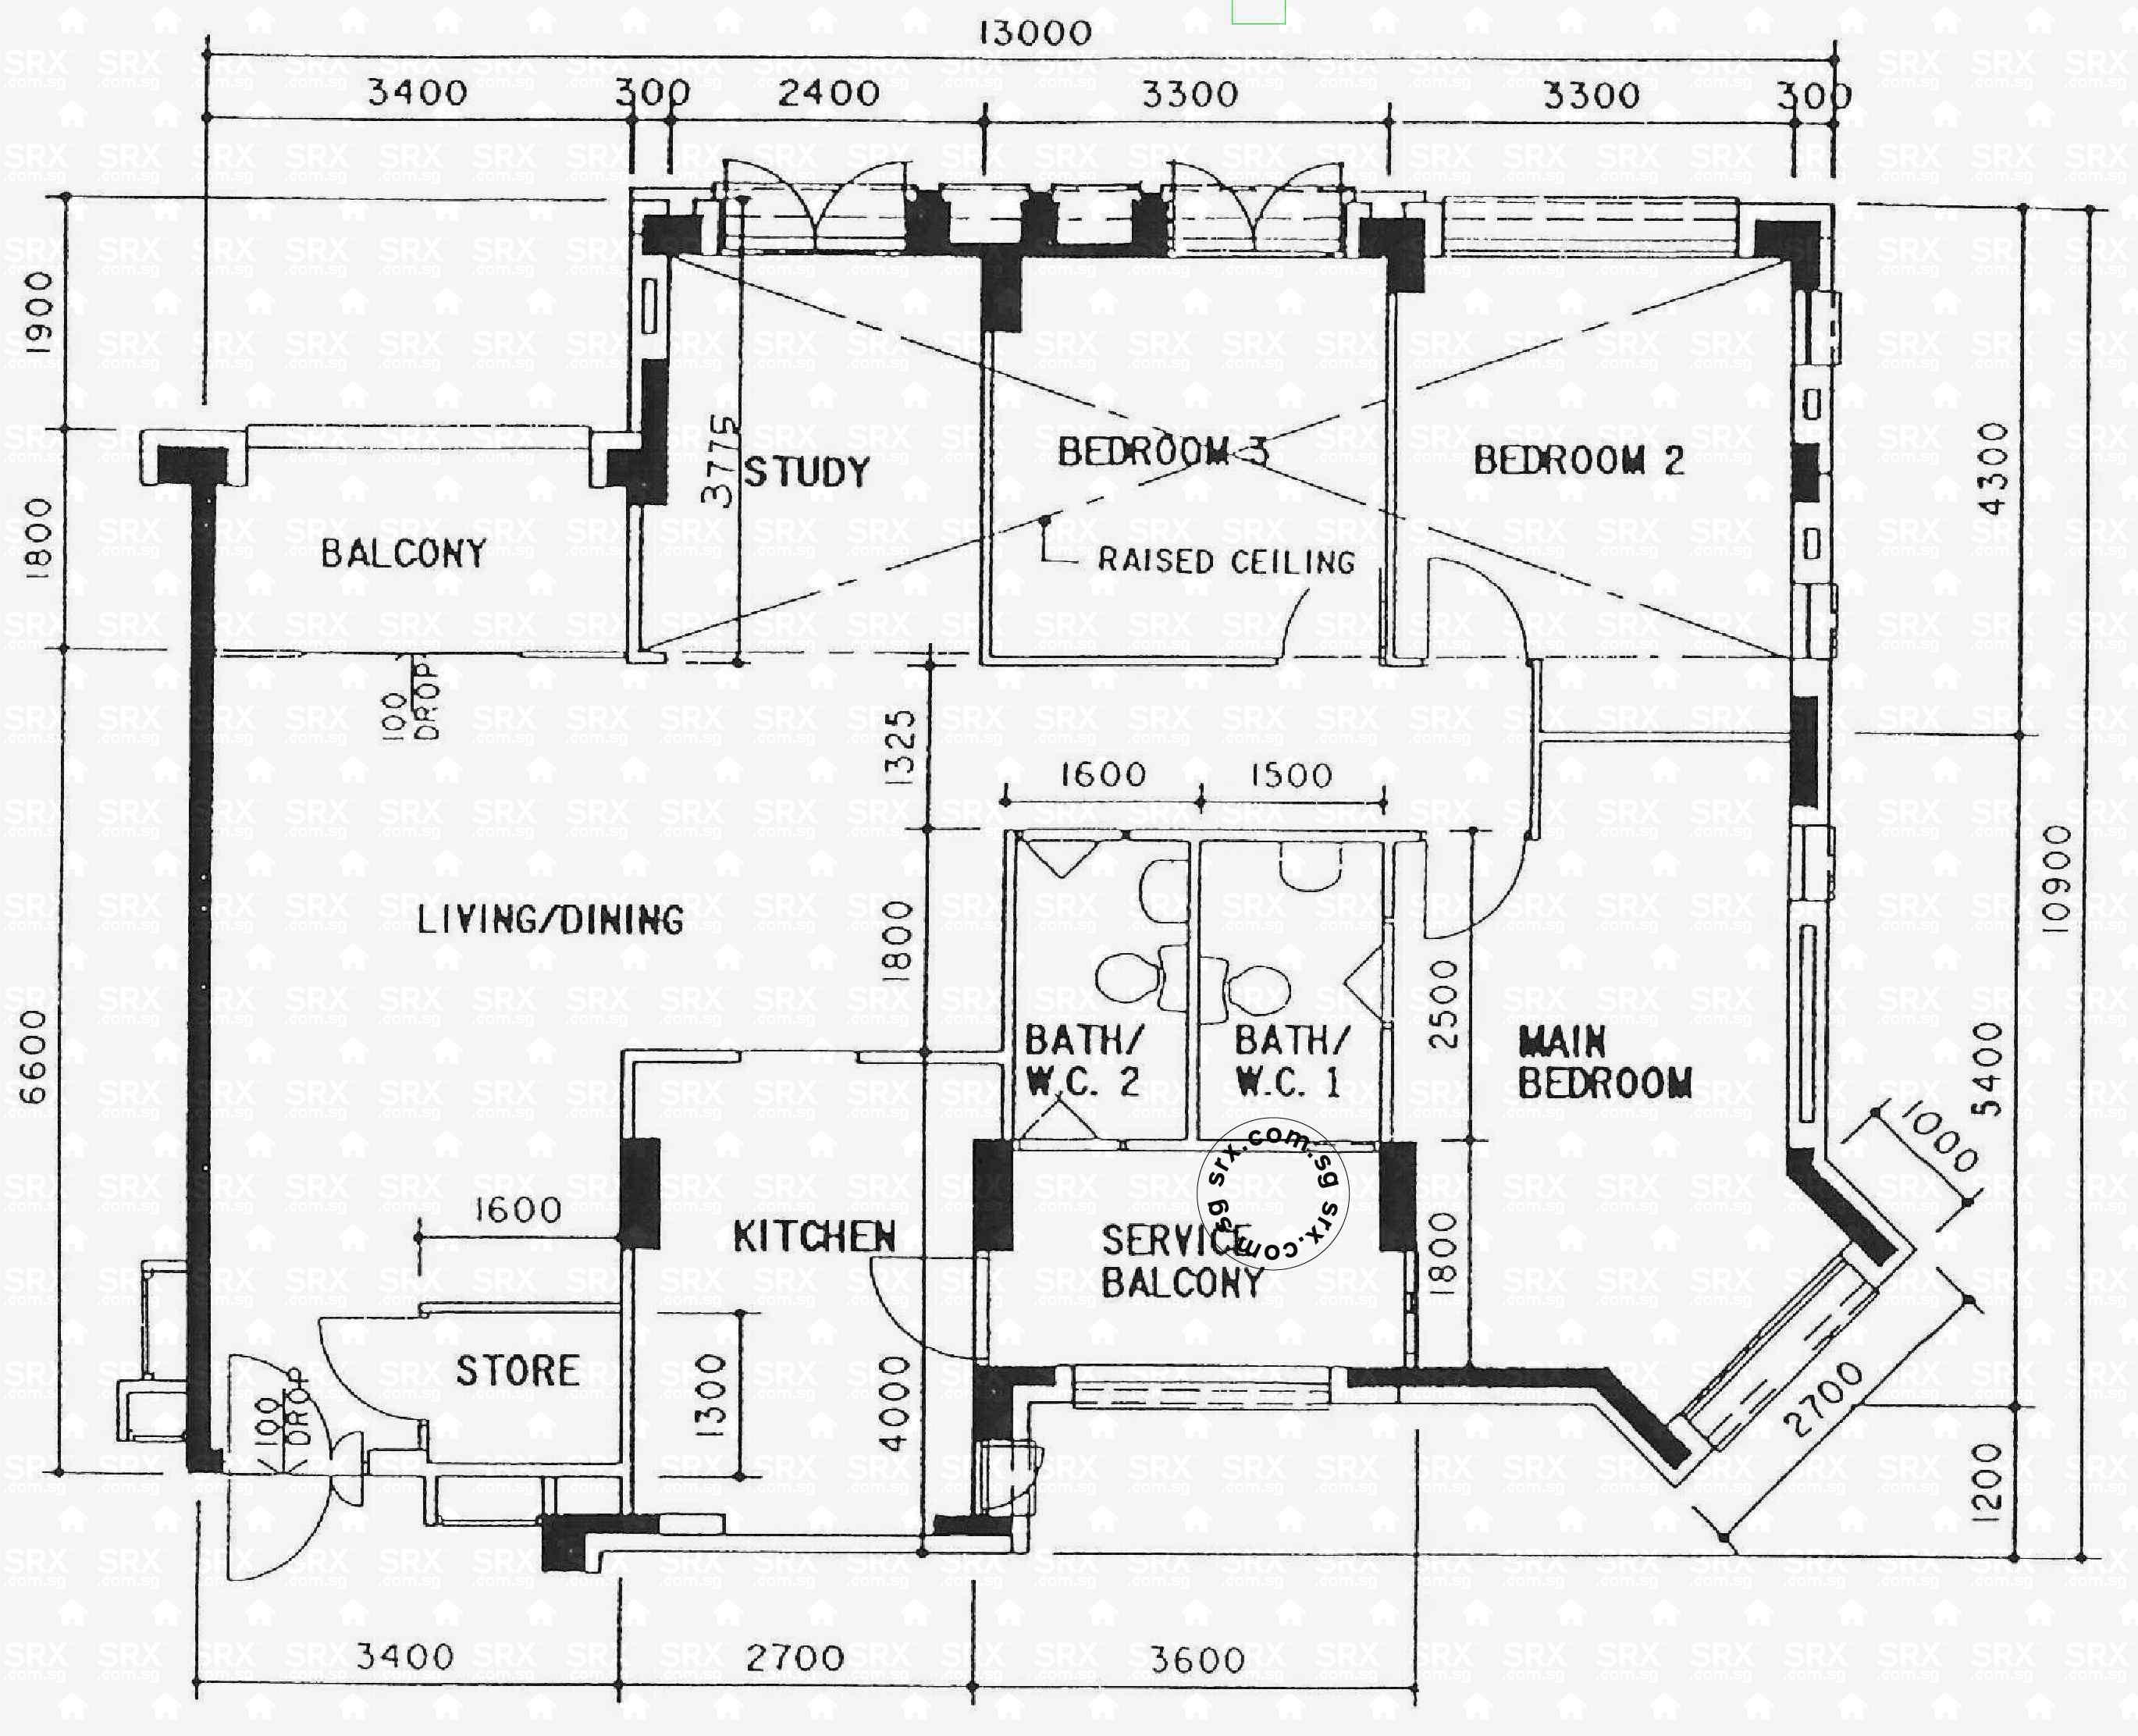 floor plans for woodlands avenue  hdb details  srx property - blk   (typical)